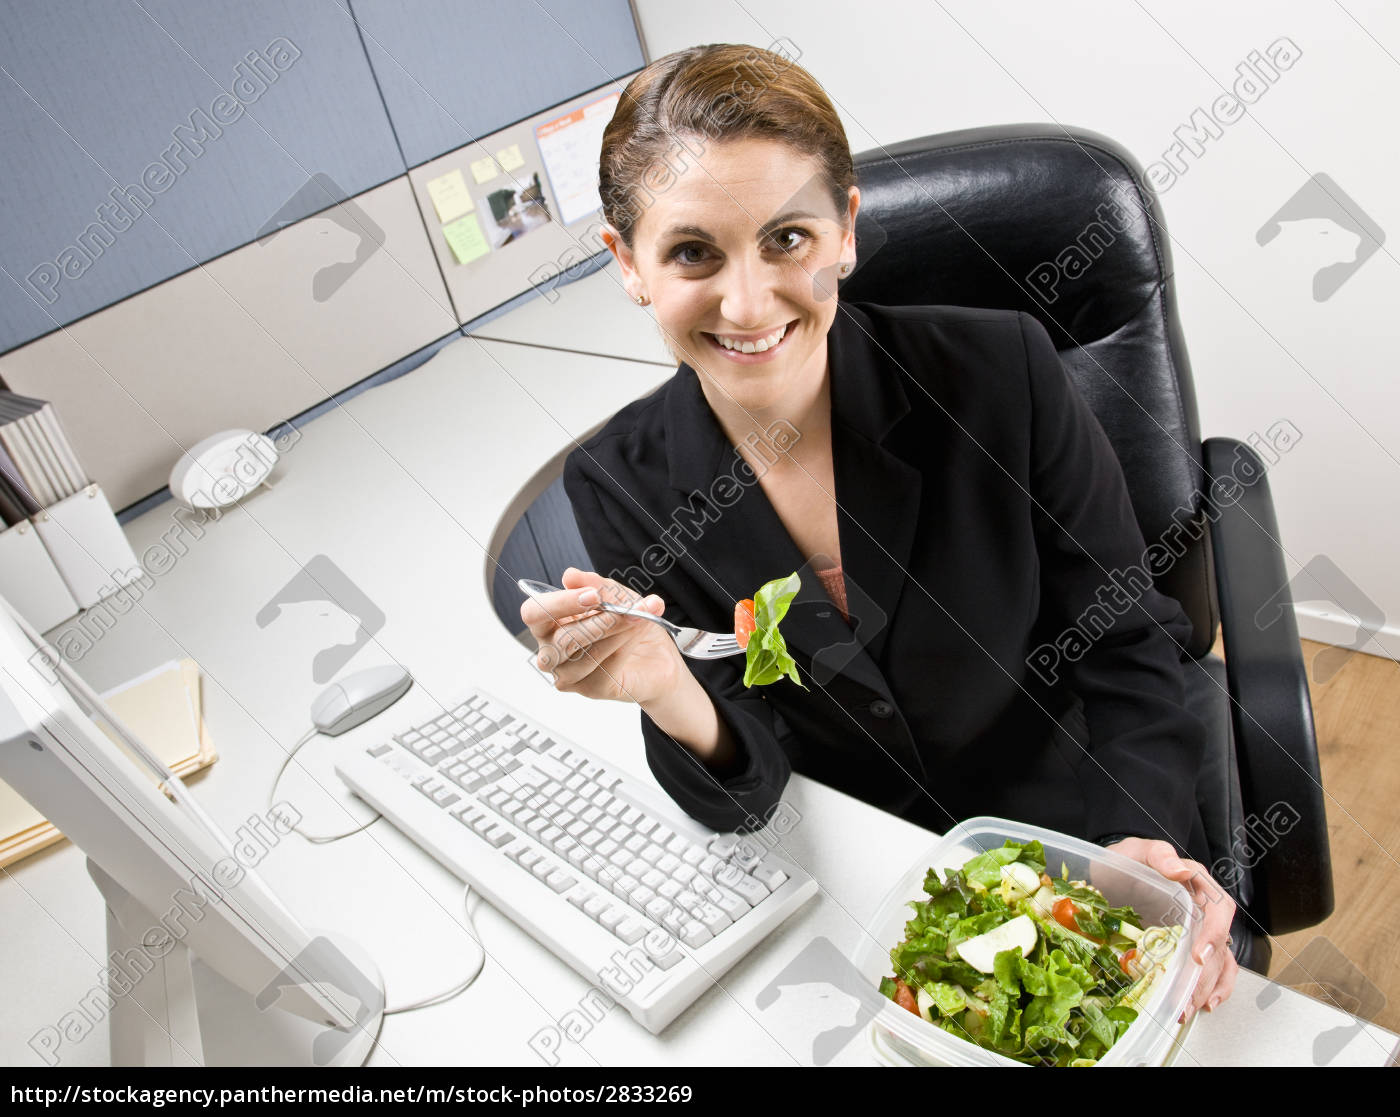 businesswoman, eating, salad, at, desk - 2833269